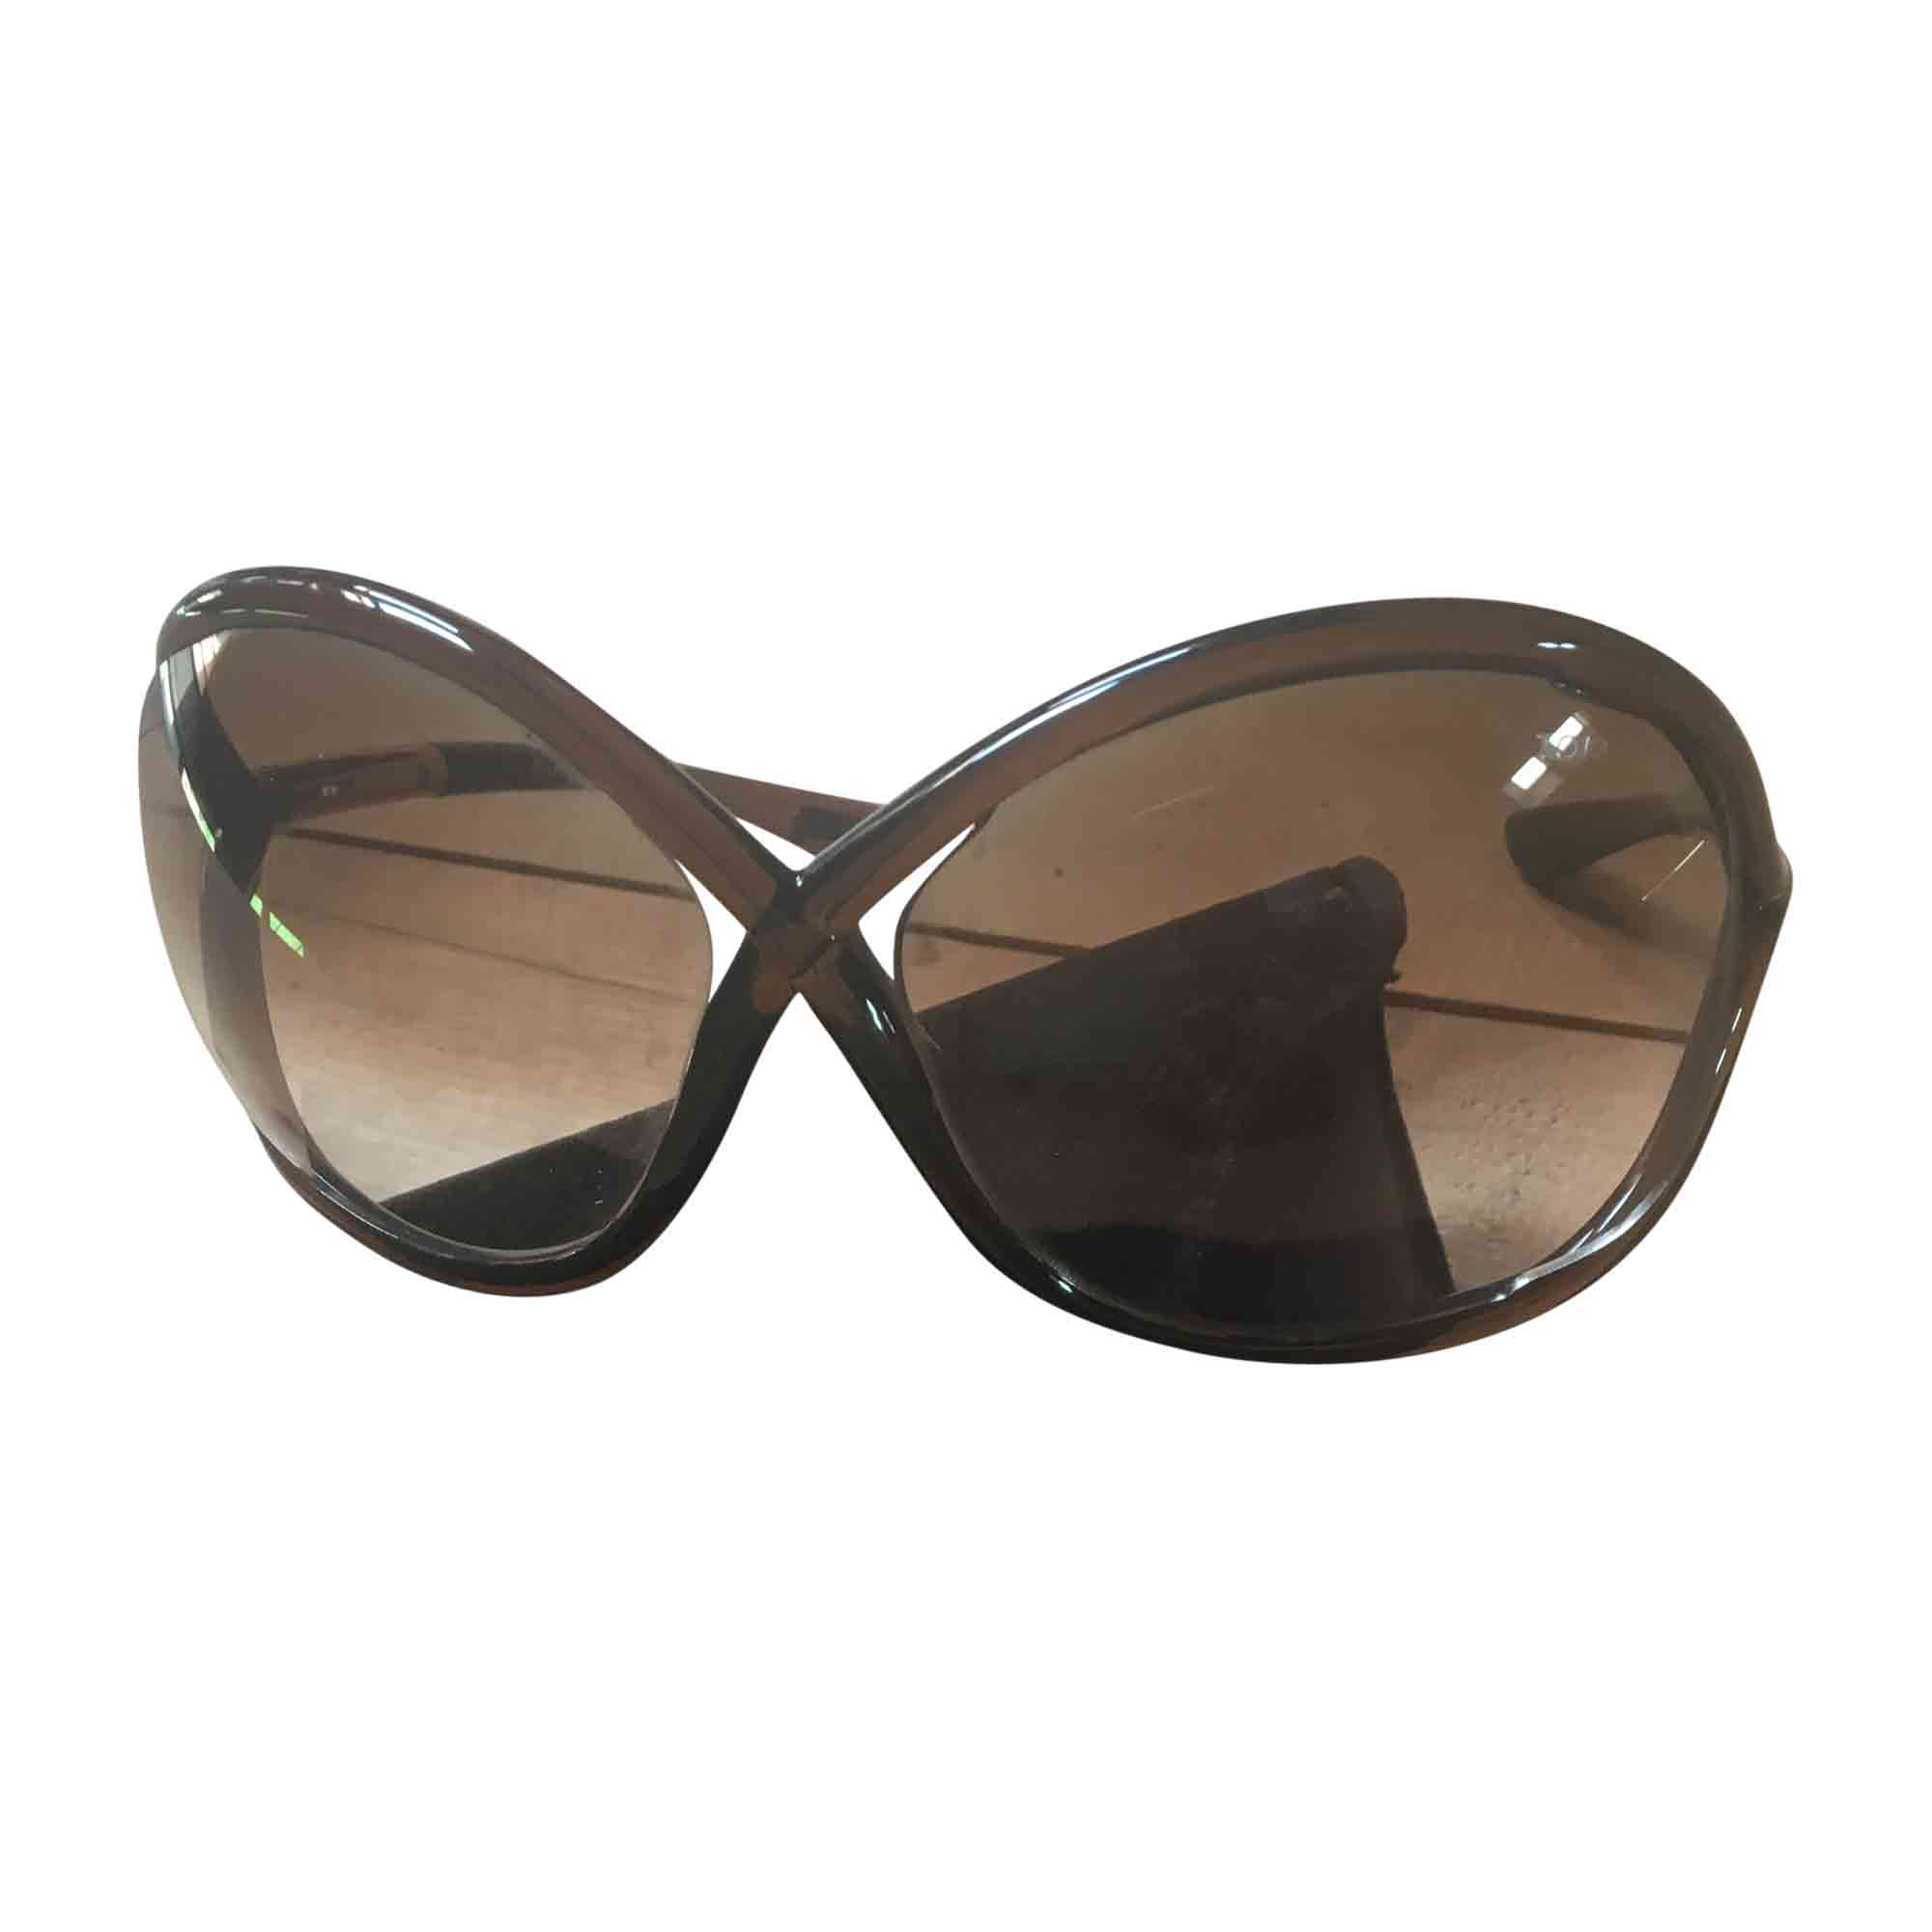 Sonnenbrille TOM FORD braun vendu par Ely8144 - 7717623